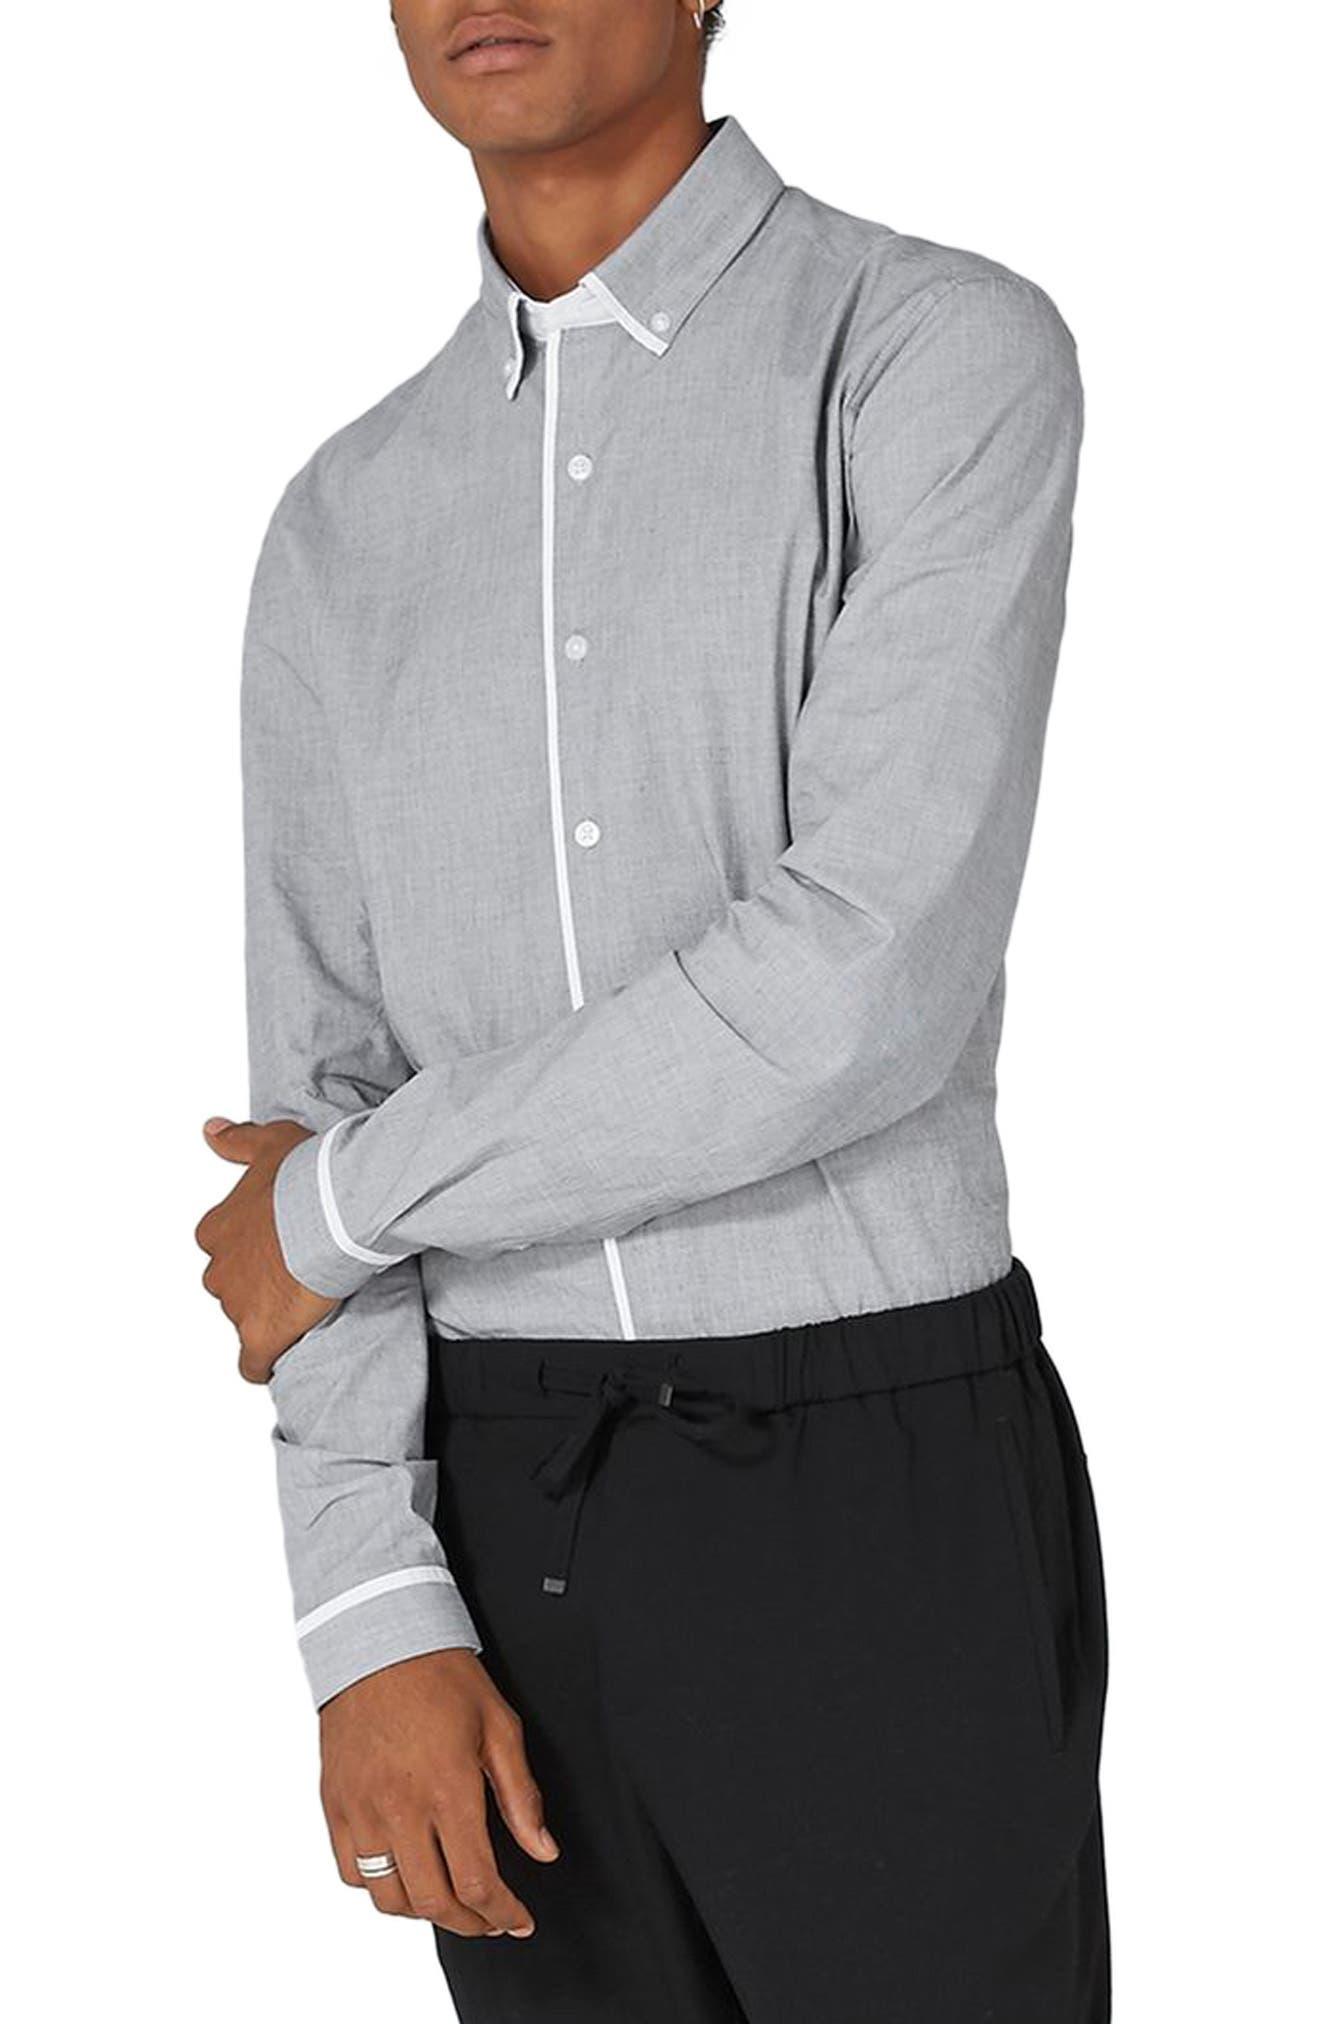 Leeson Slim Fit Smart Shirt,                         Main,                         color, 020